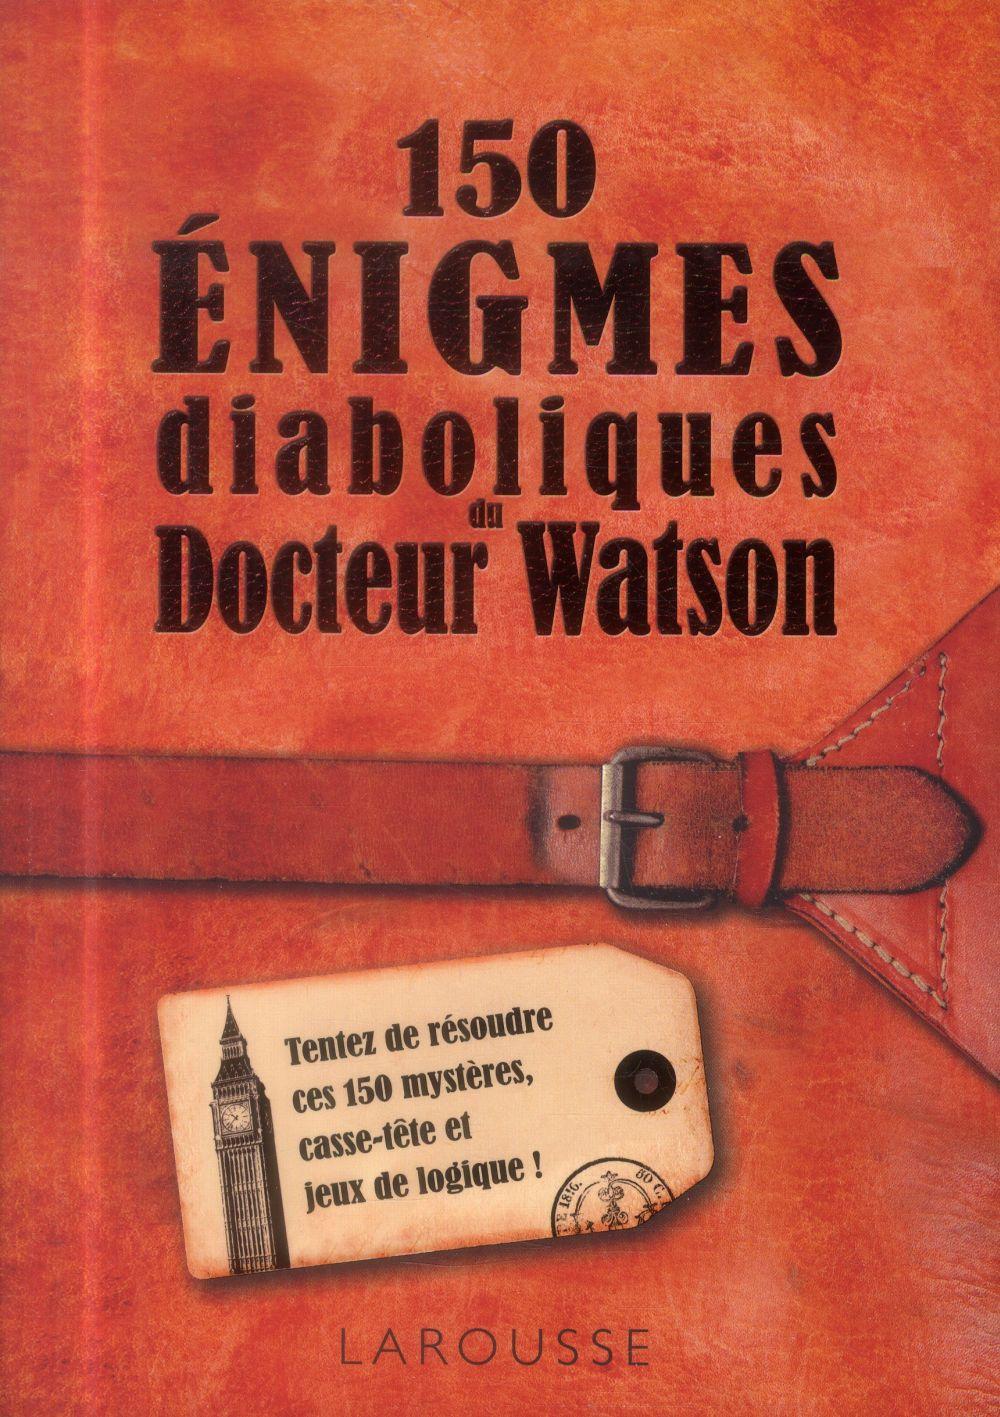 150 ENIGMES DU DOCTEUR WATSON LEBRUN SANDRA Larousse